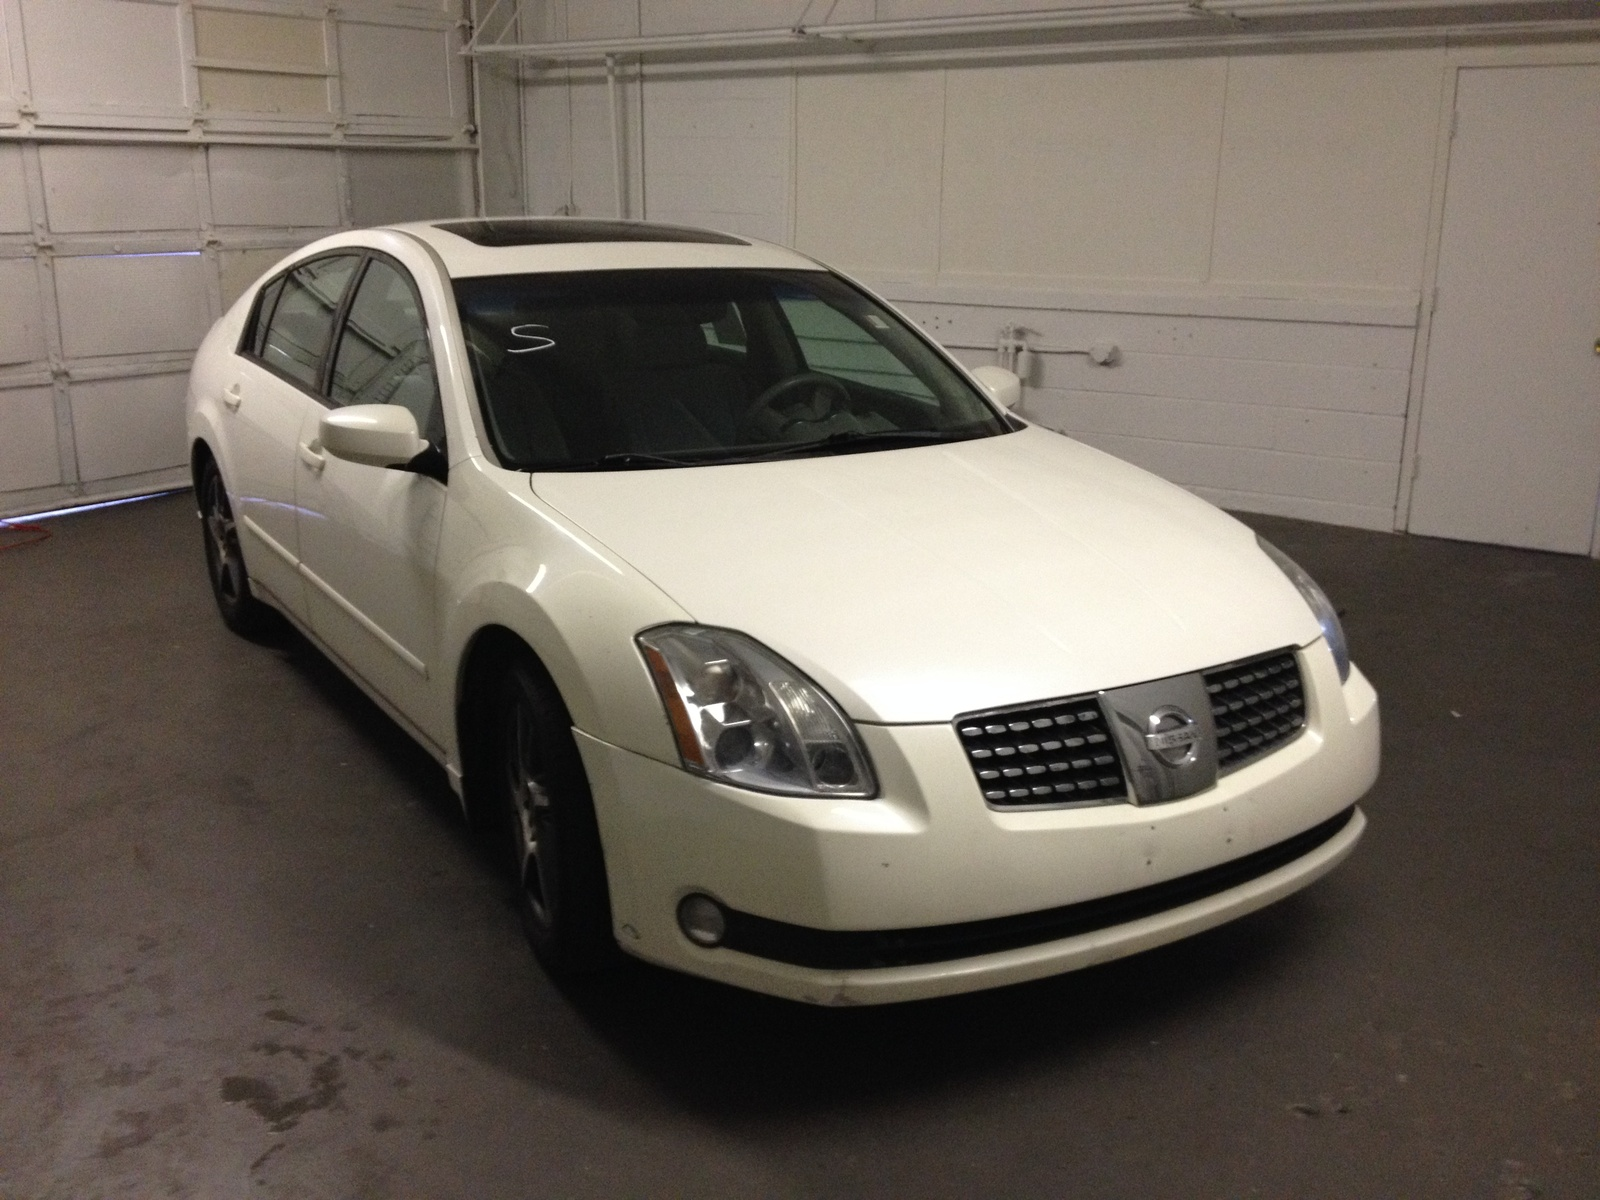 2005 Nissan Maxima - Overview - CarGurus